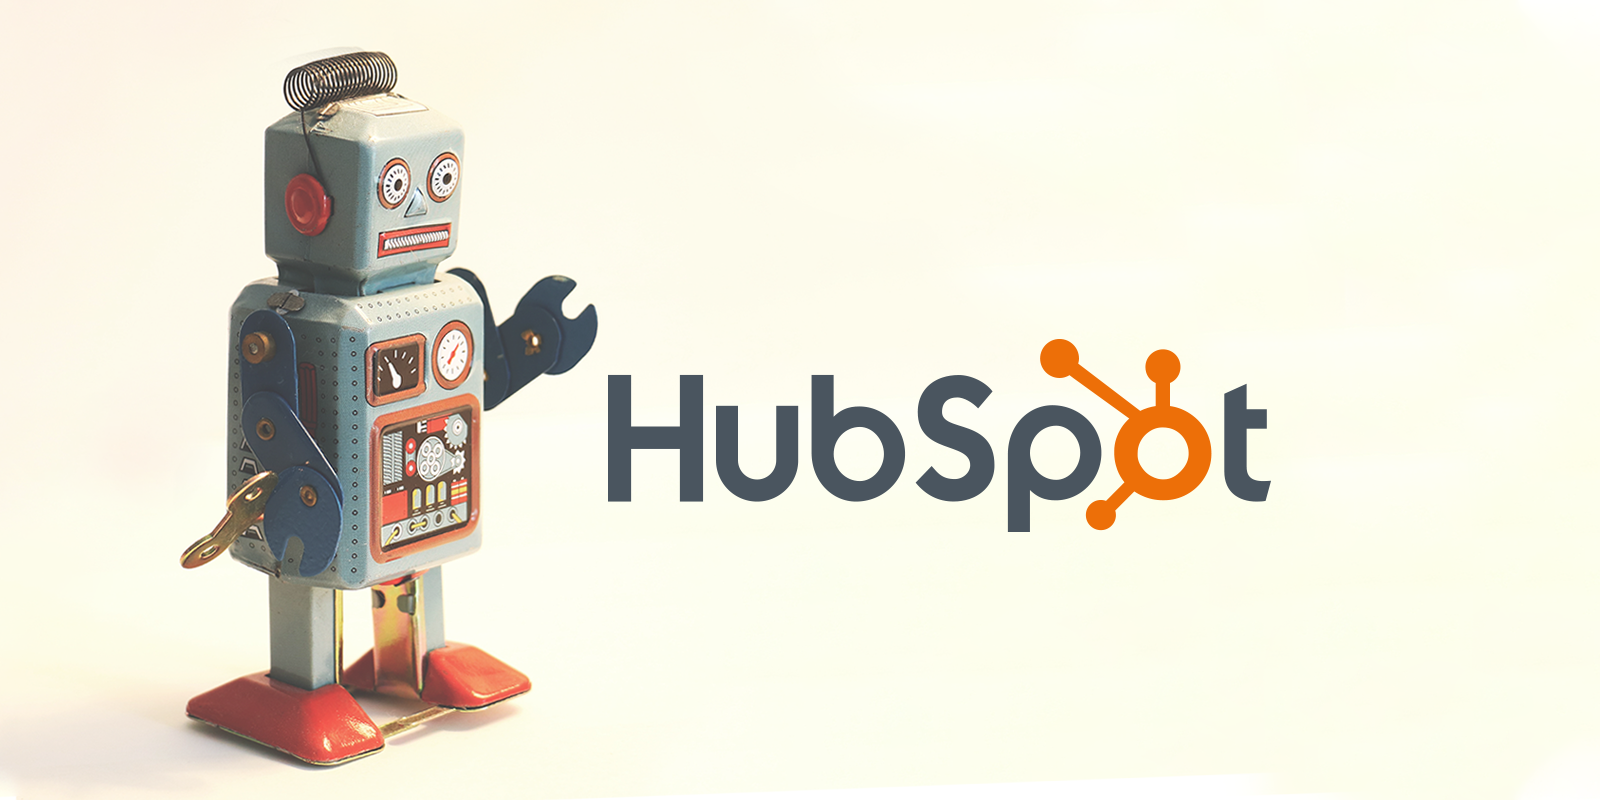 The Power of HubSpotΓÇÖs Marketing Automation